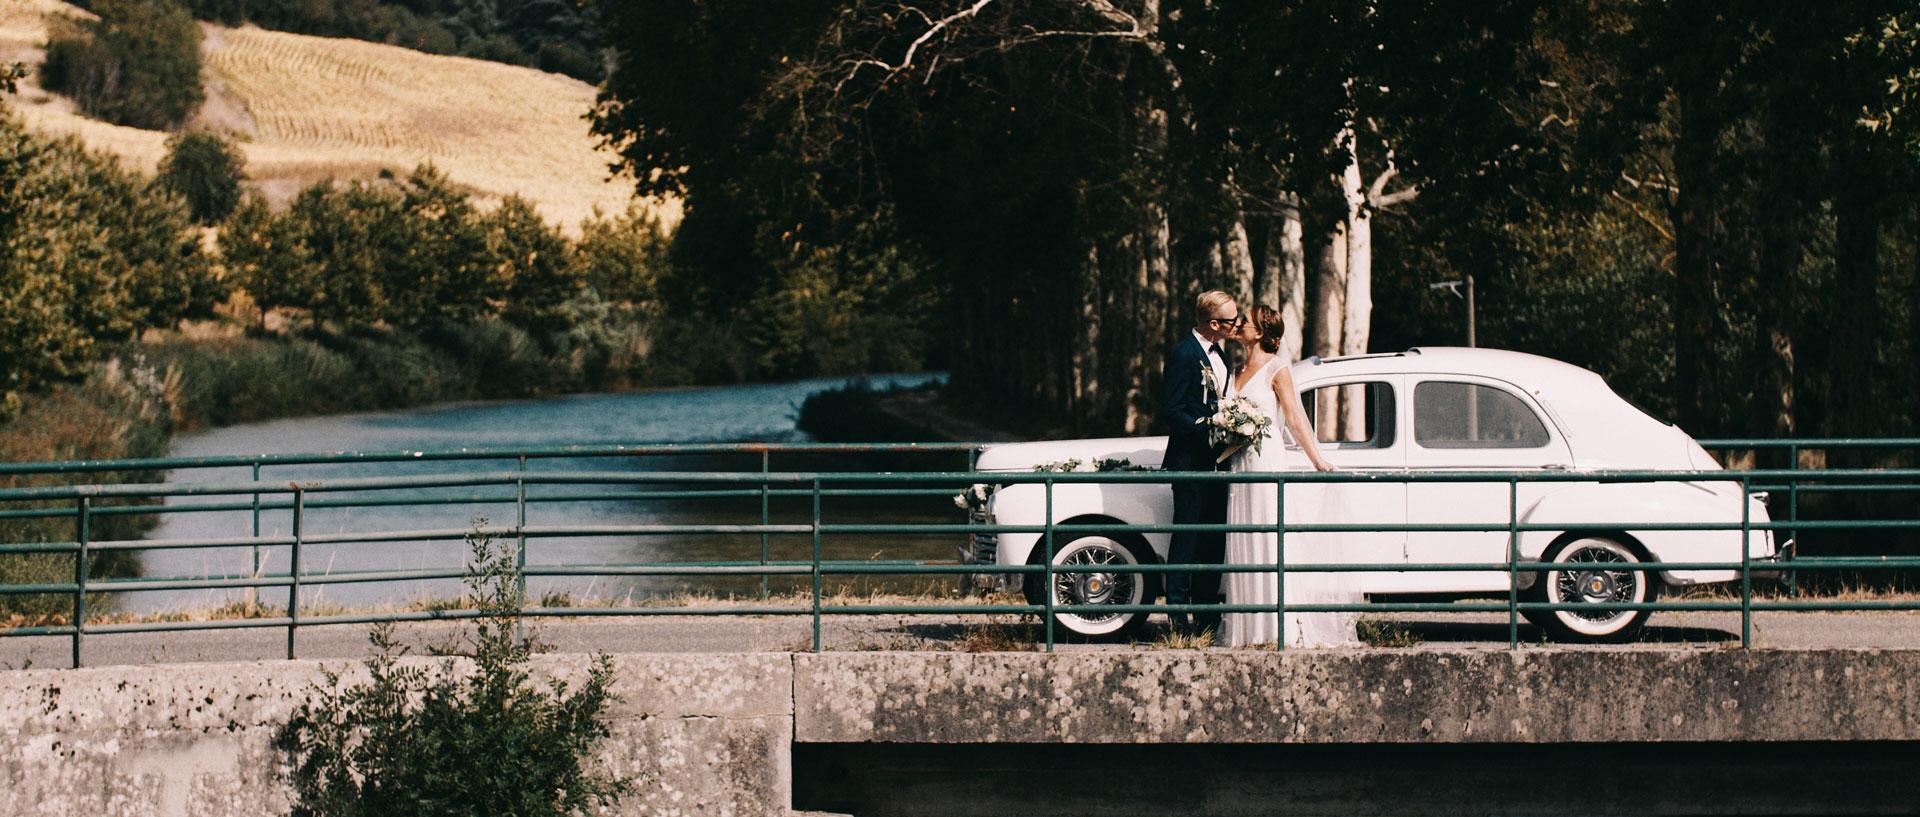 Chic and festive german wedding - Domaine de Ferrabouc - CarcassonneAngelina & Markus